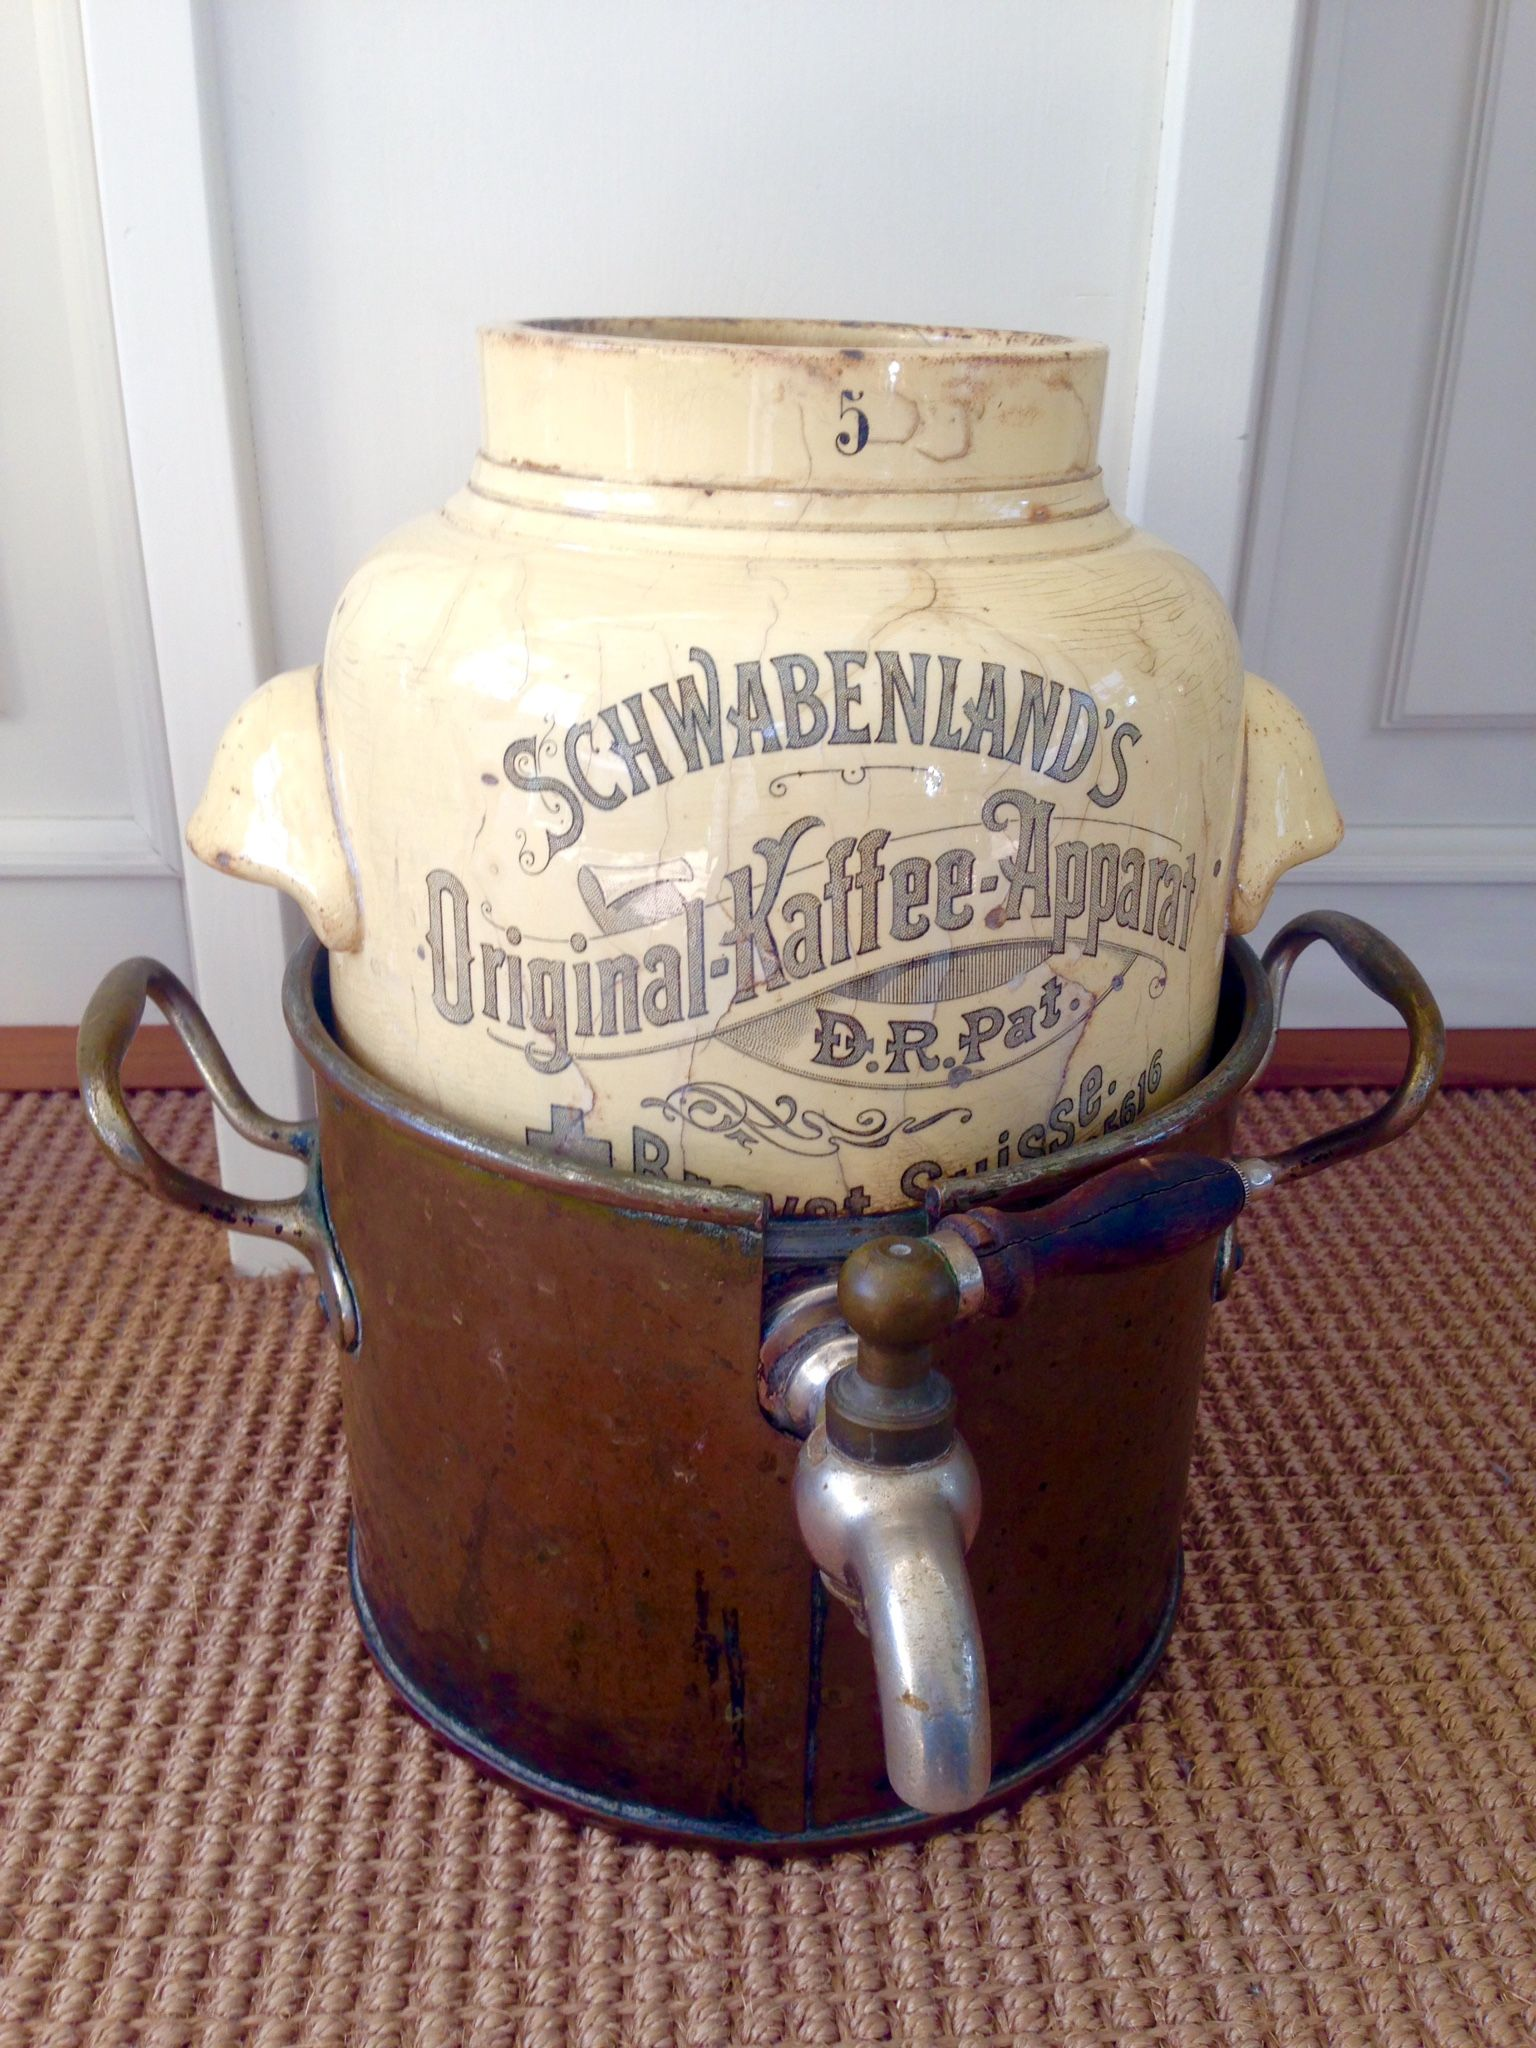 german coffeemaker original schwabenland 39 s kaffeeapparat d r p made in germany vintage. Black Bedroom Furniture Sets. Home Design Ideas